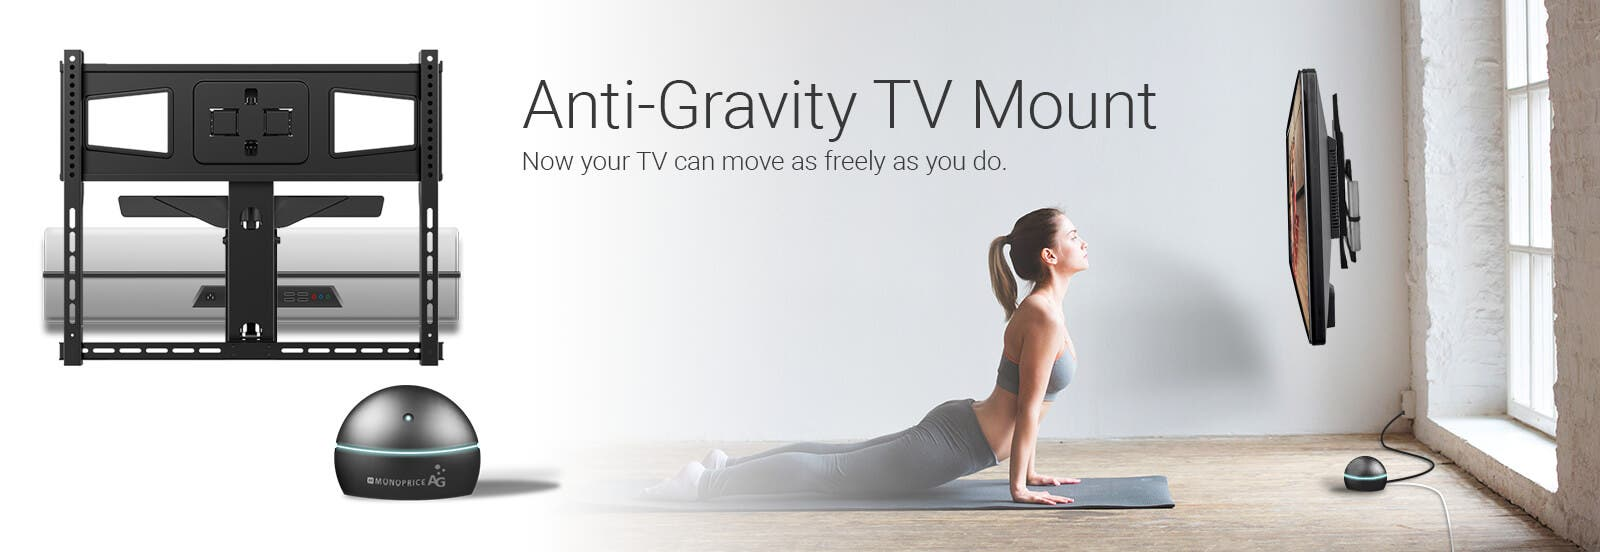 anti gravity tv mount